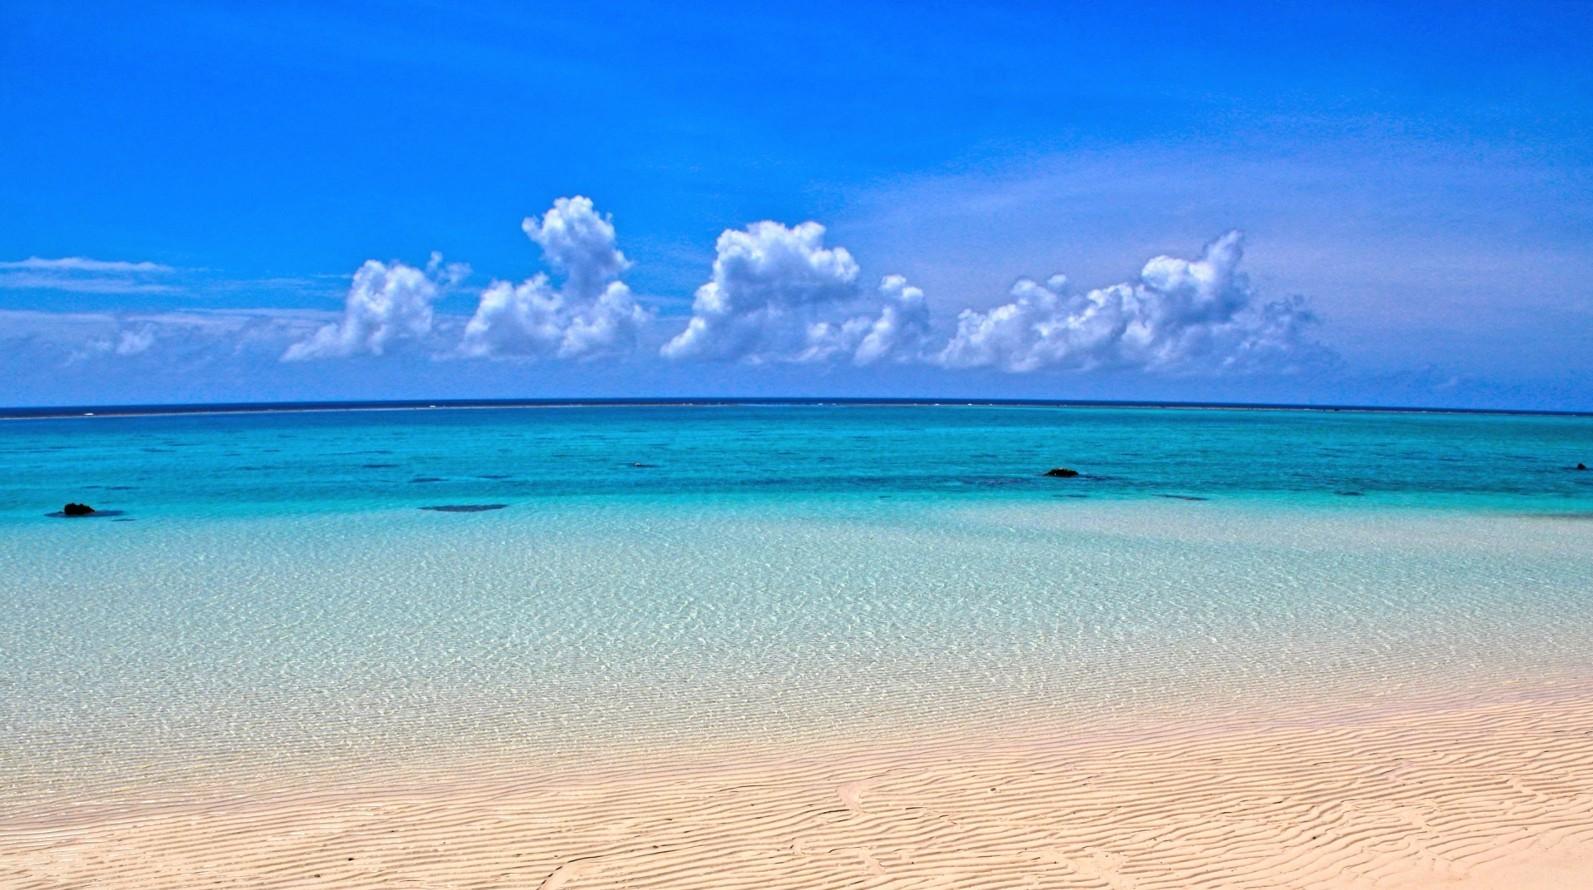 The beautiful Okinawa beach